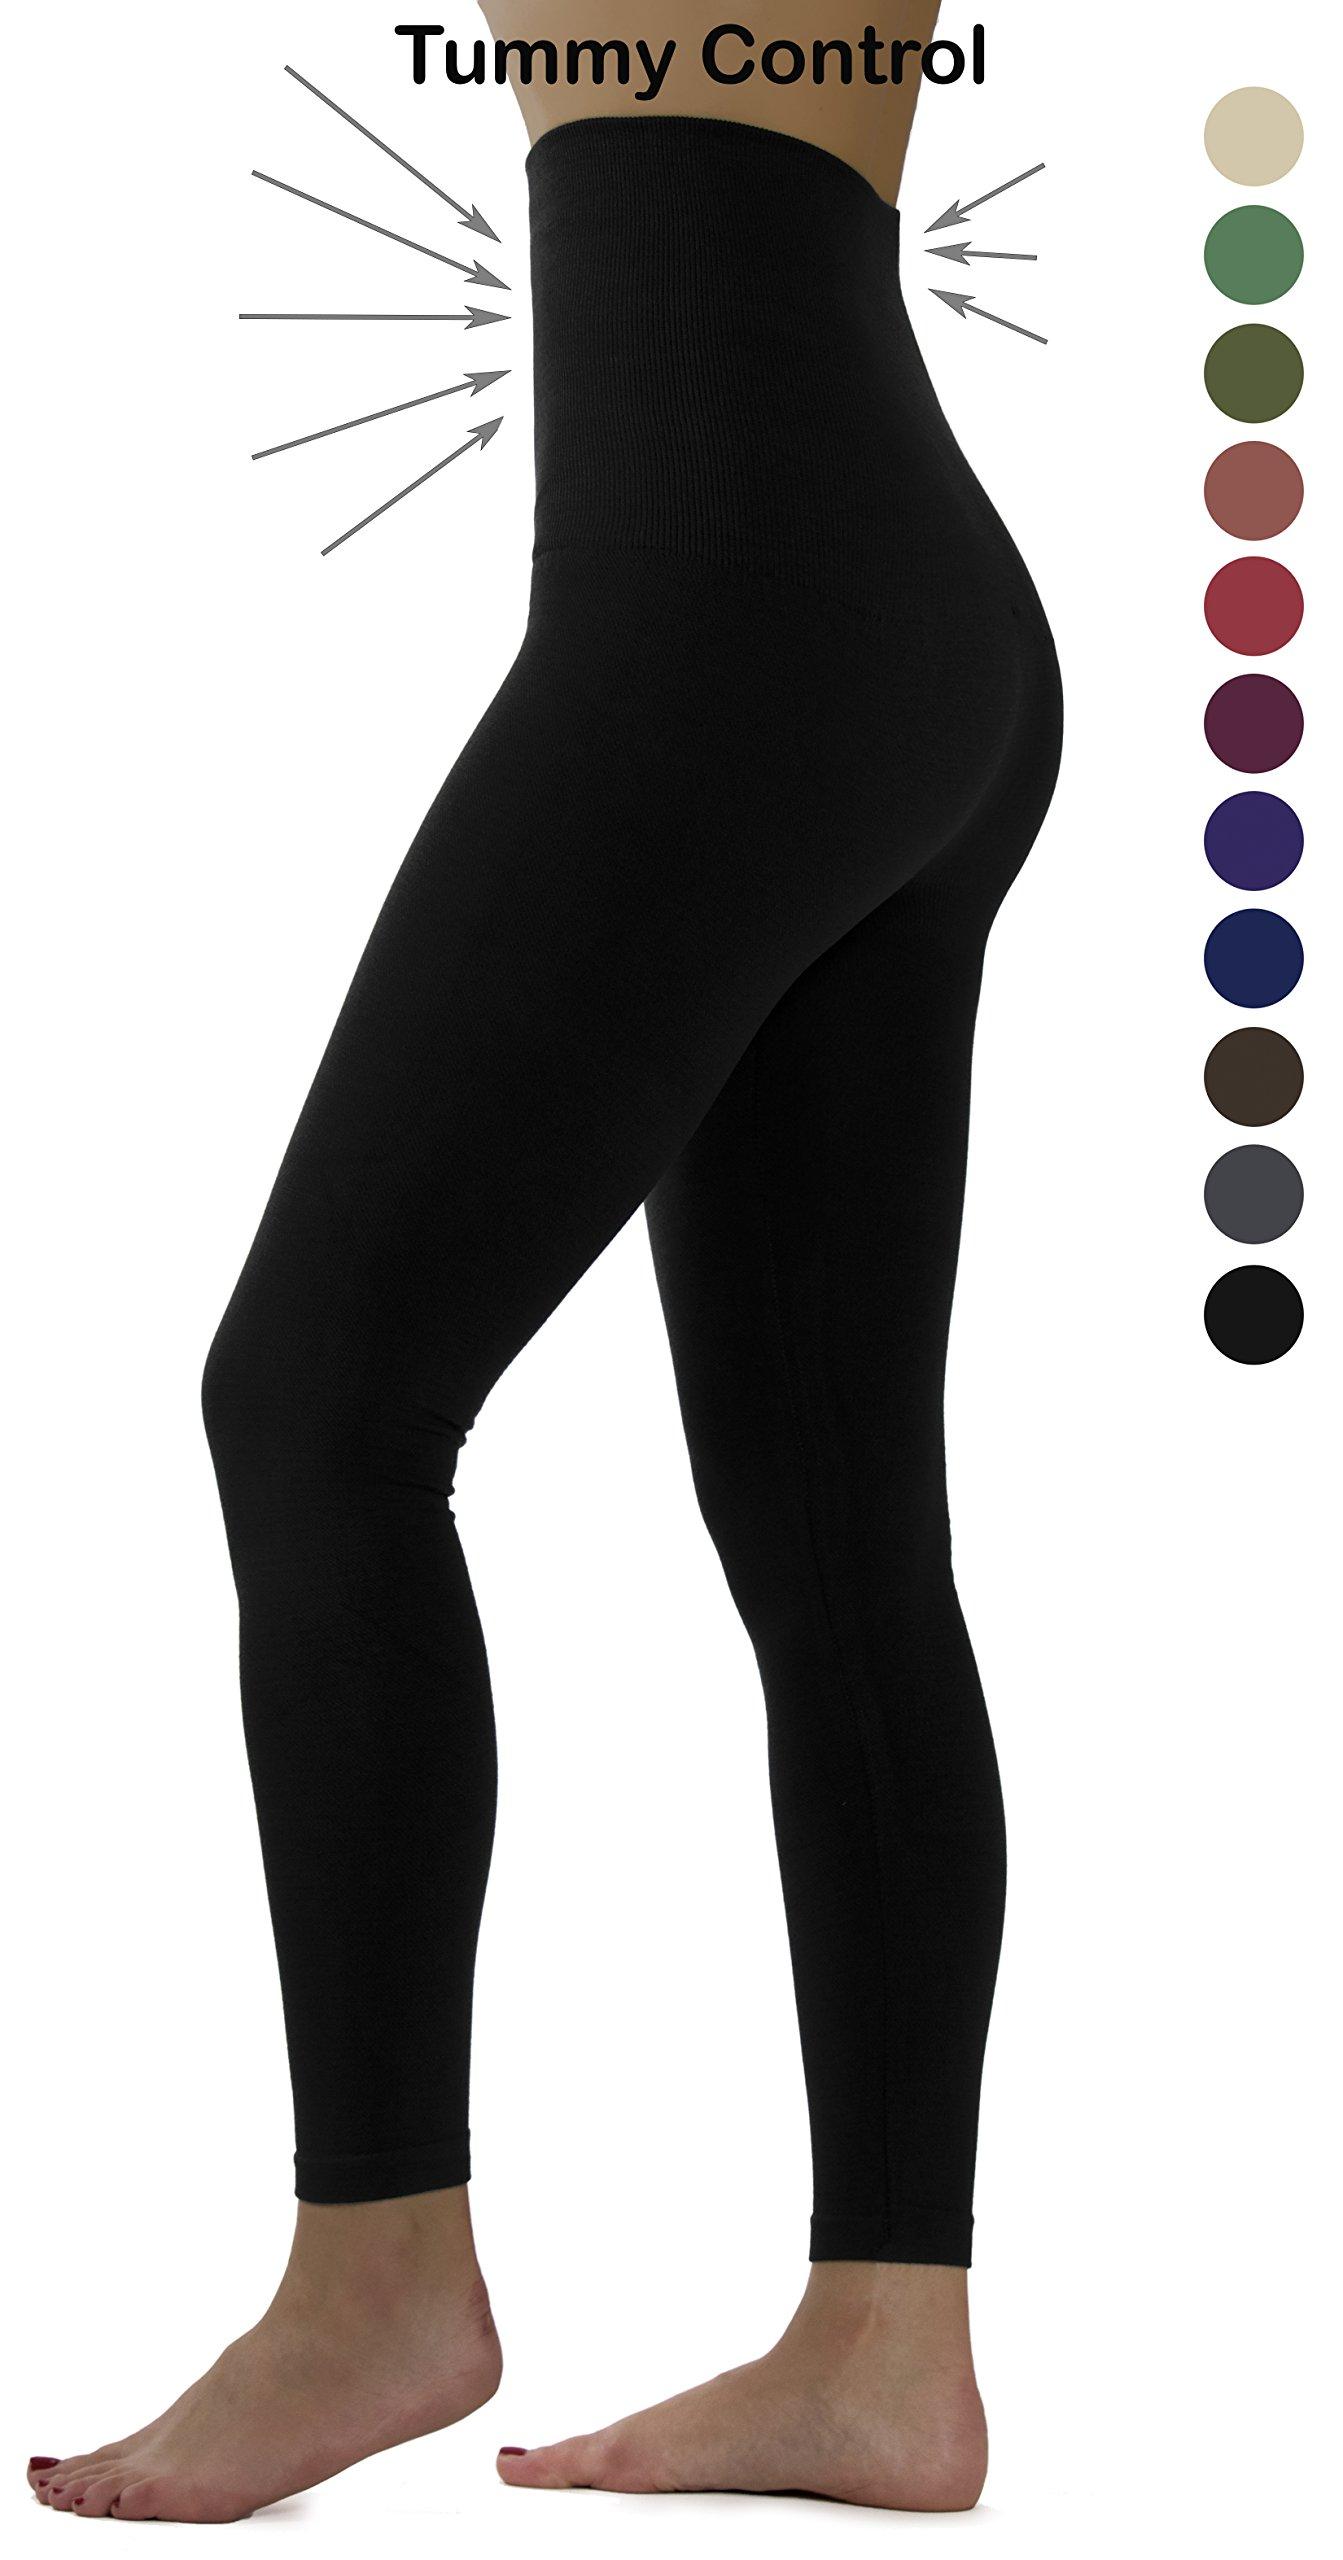 Ylluo Premium Tummy Support Slimming Leggings Thick High Waist Fleece and Non Fleece (L/XL/XXL (US Size 12-18), Black)